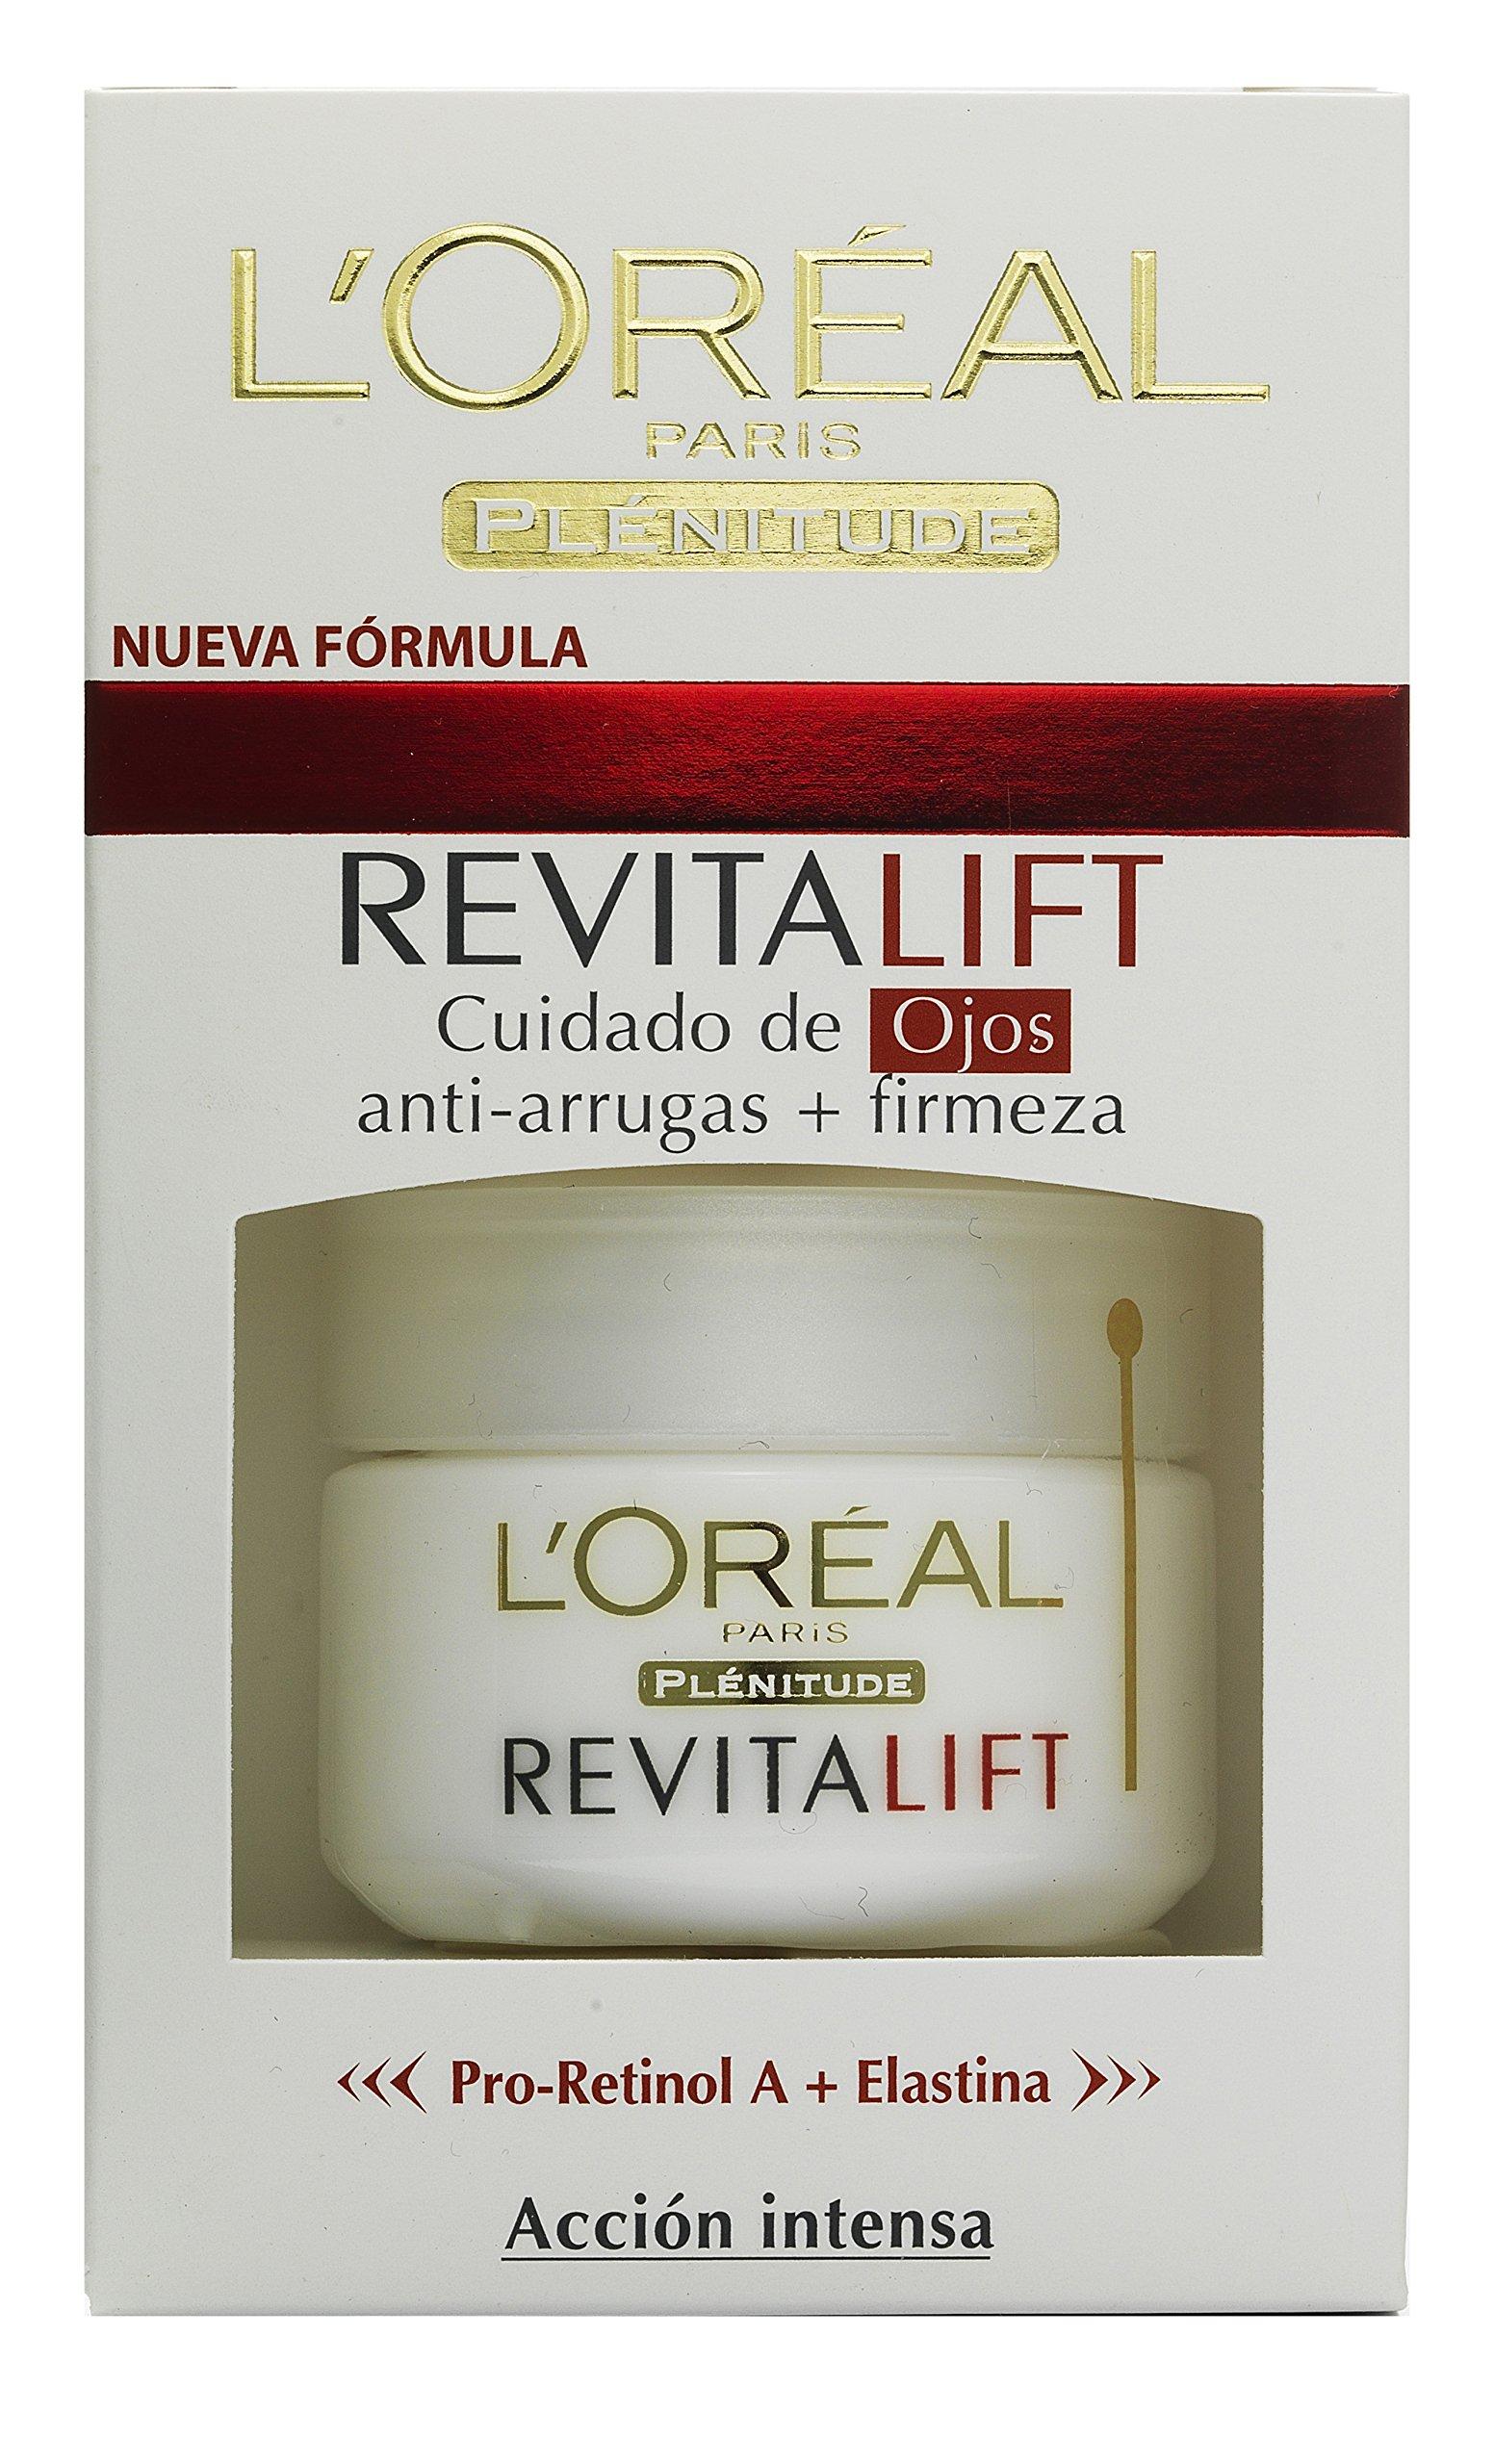 LOreal Paris Dermo Expertise Crema Contorno de Ojos Revitalift - 15 ml product image